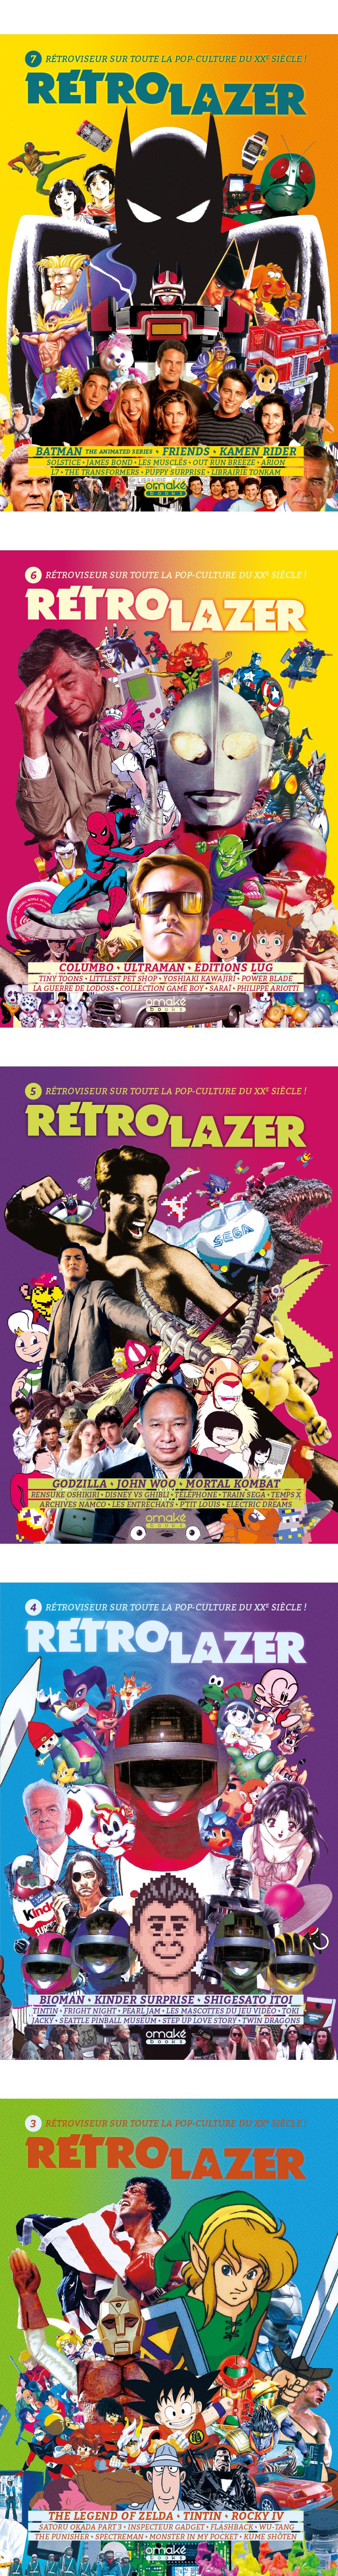 Rétro Lazer #7